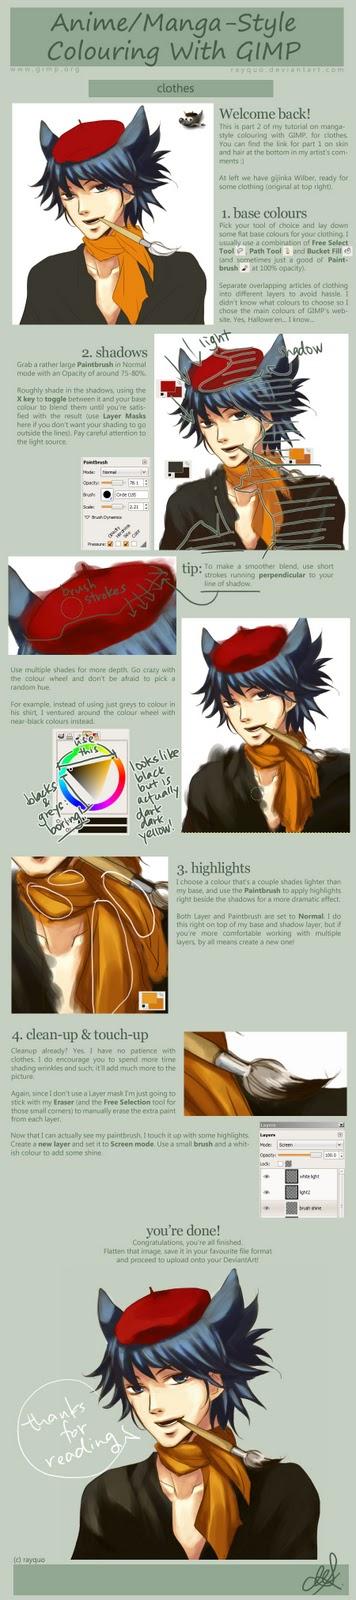 Tutorial How To Drawing Manga and Anime